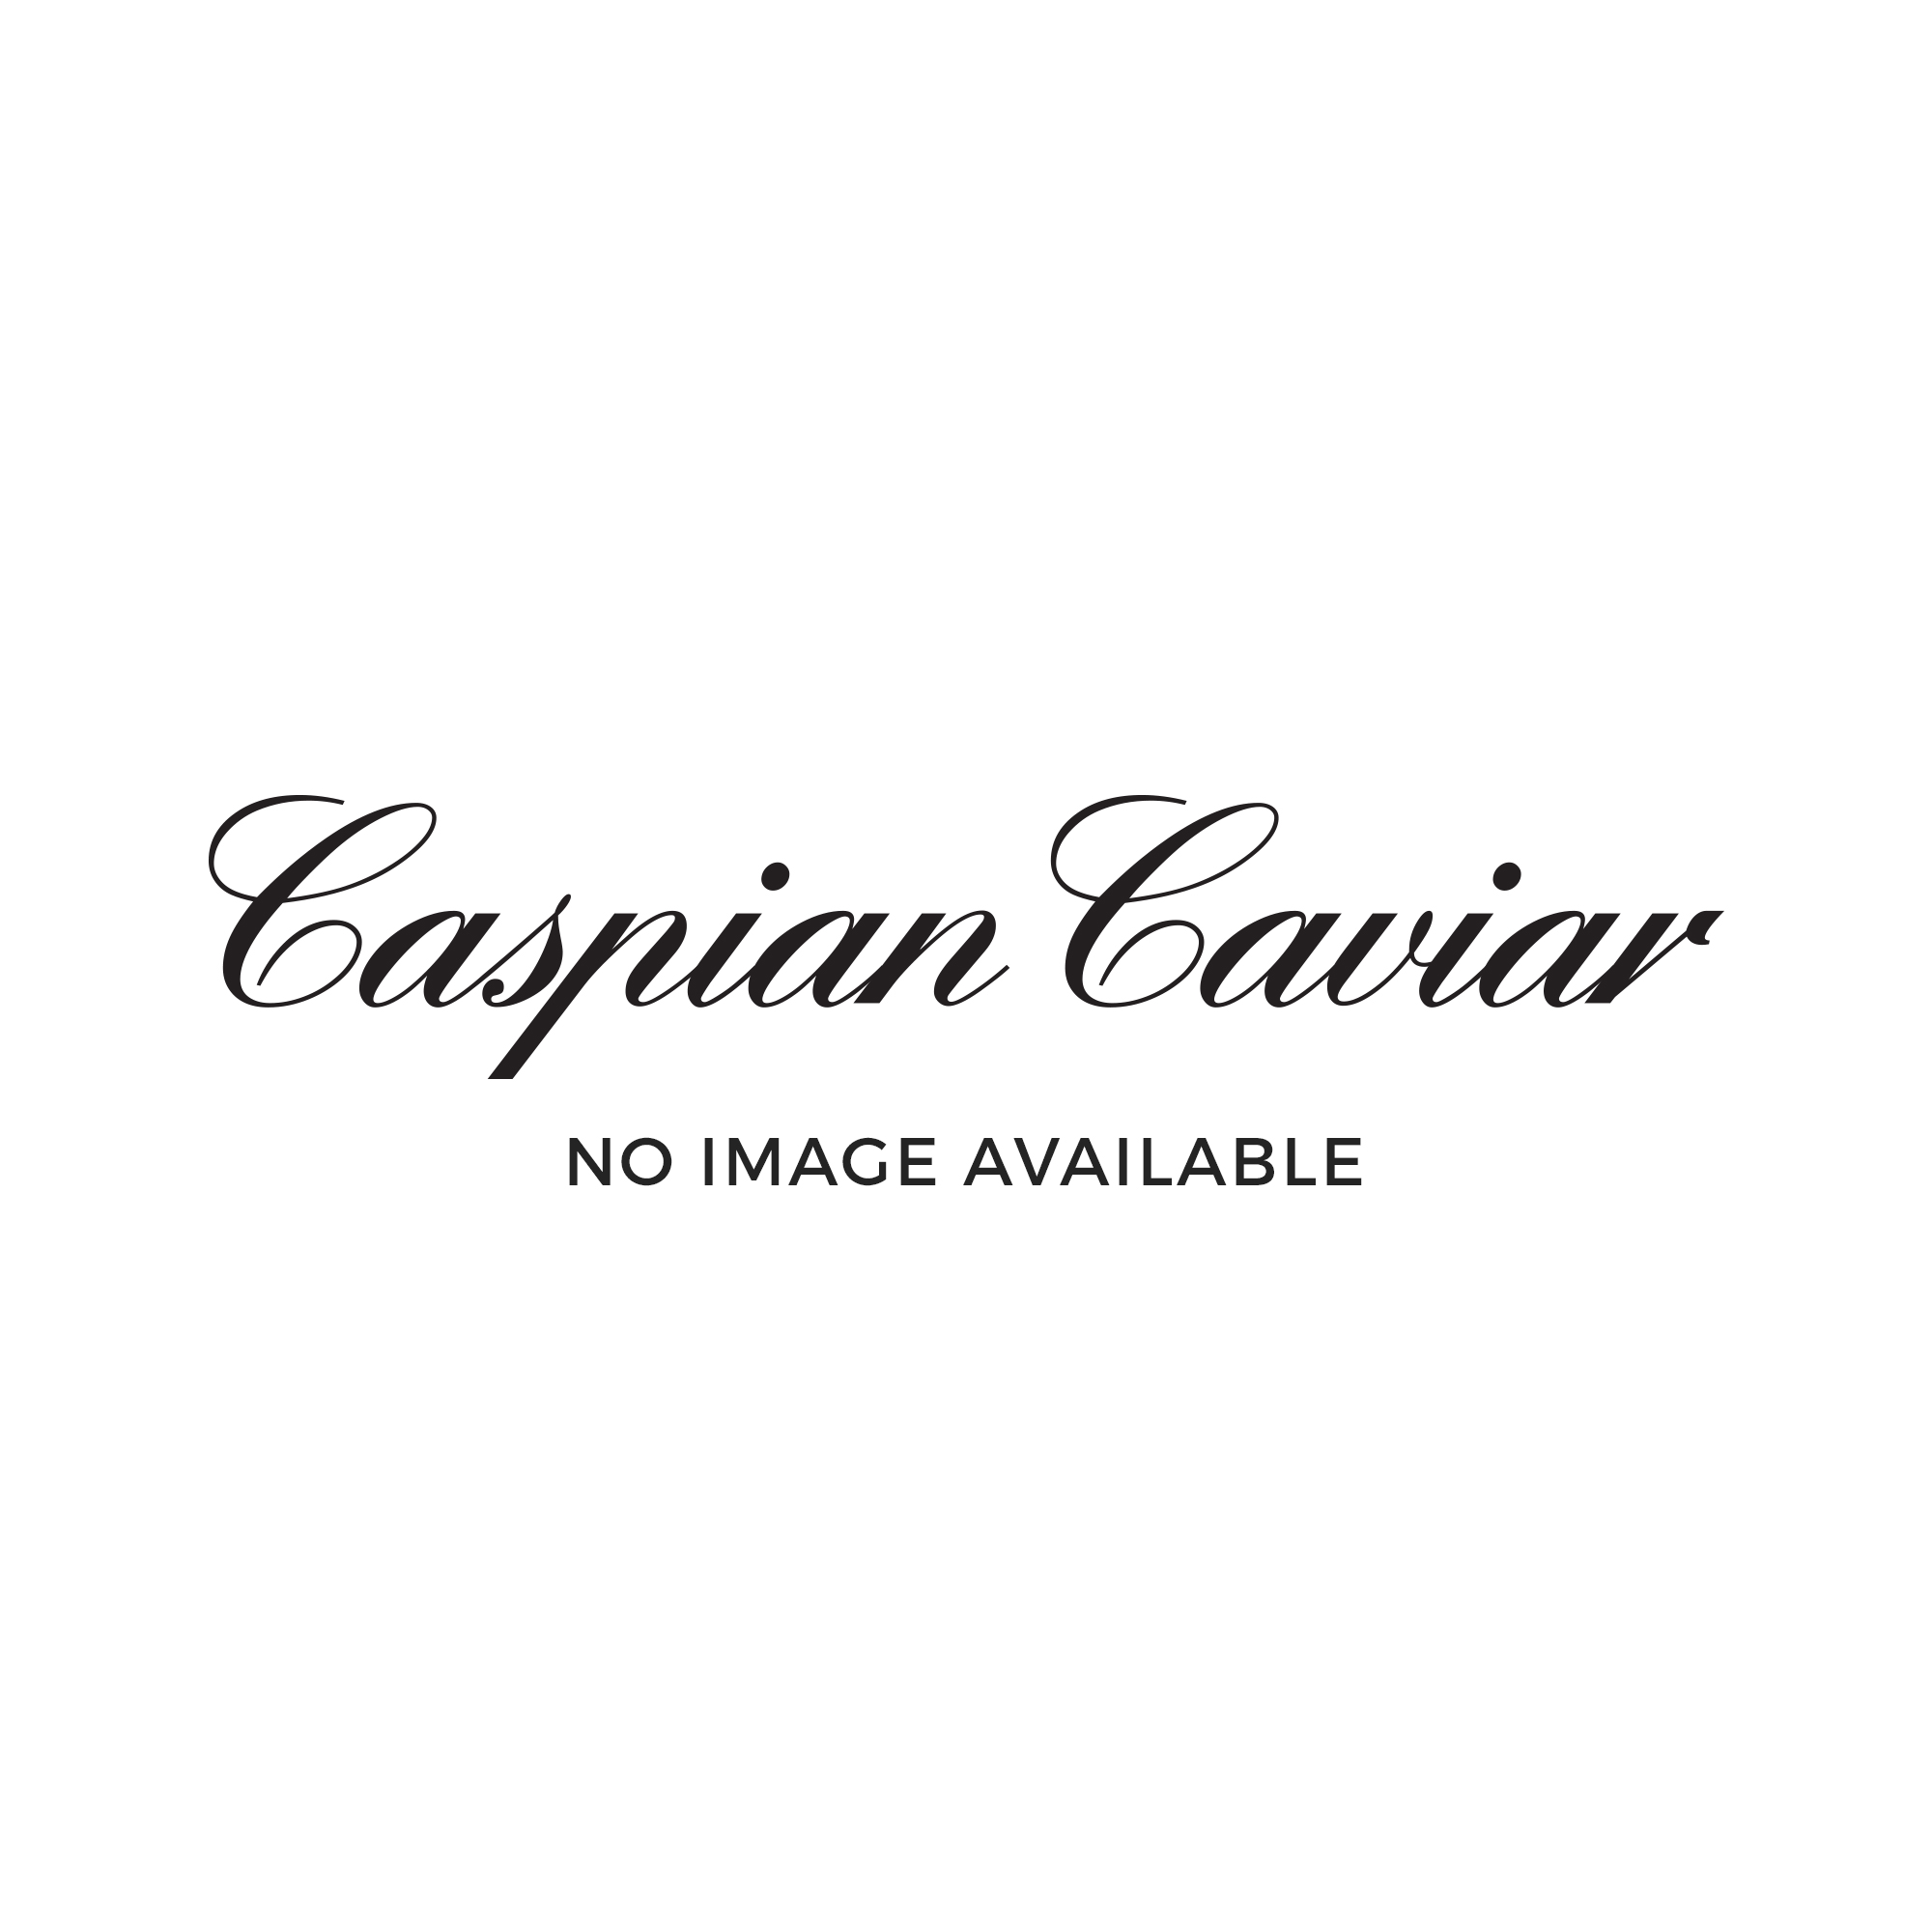 Caspian Caviar White 250g